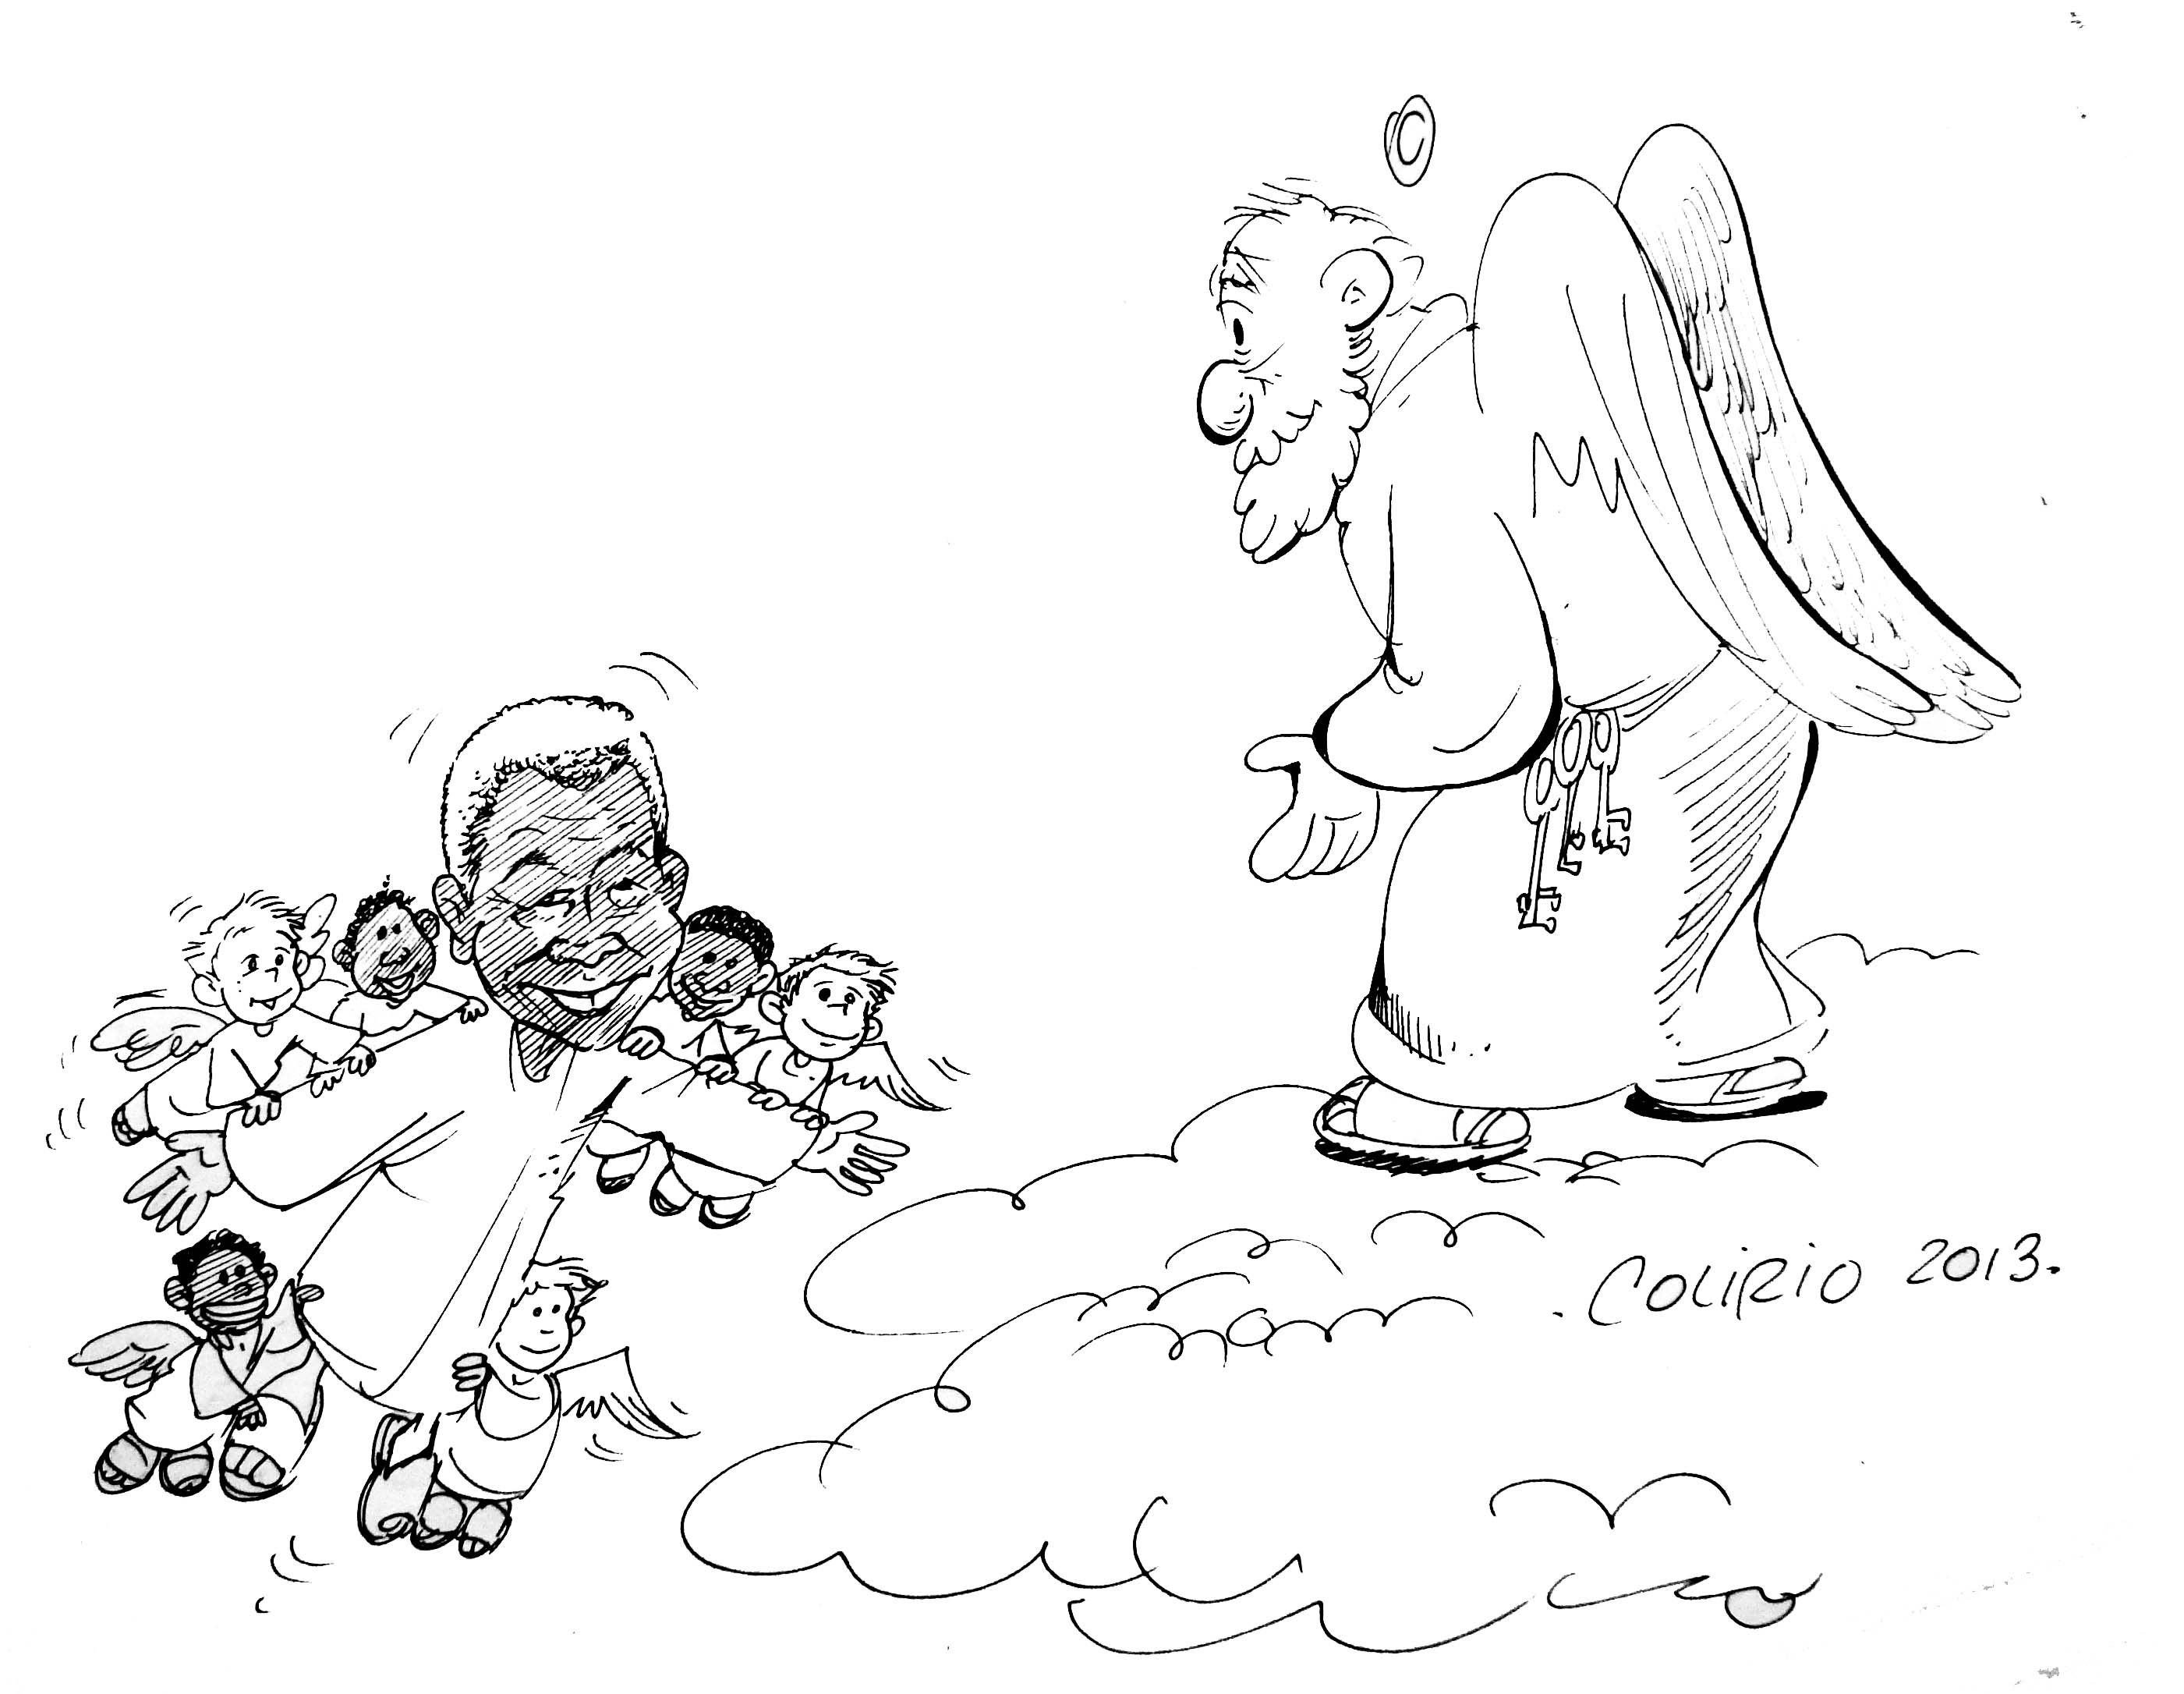 carica sabado 7 de dic de 2013